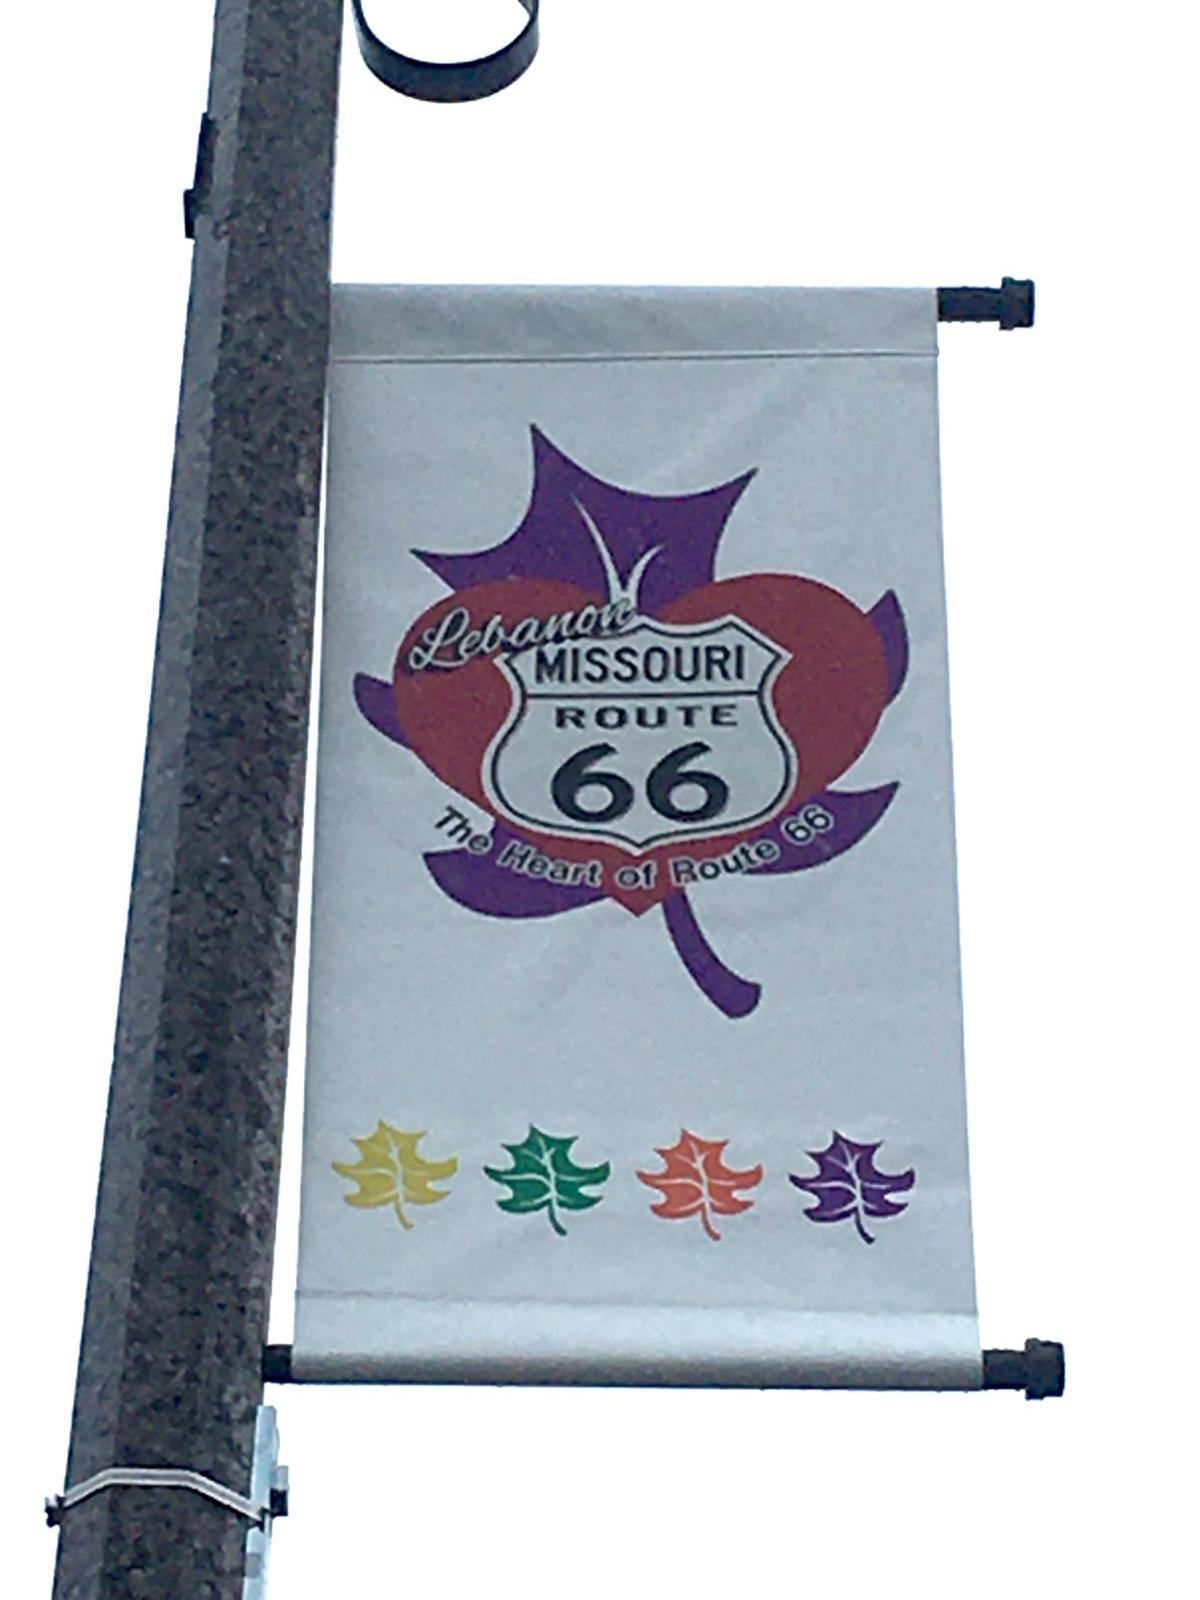 Banner pic 5-12-20.JPG